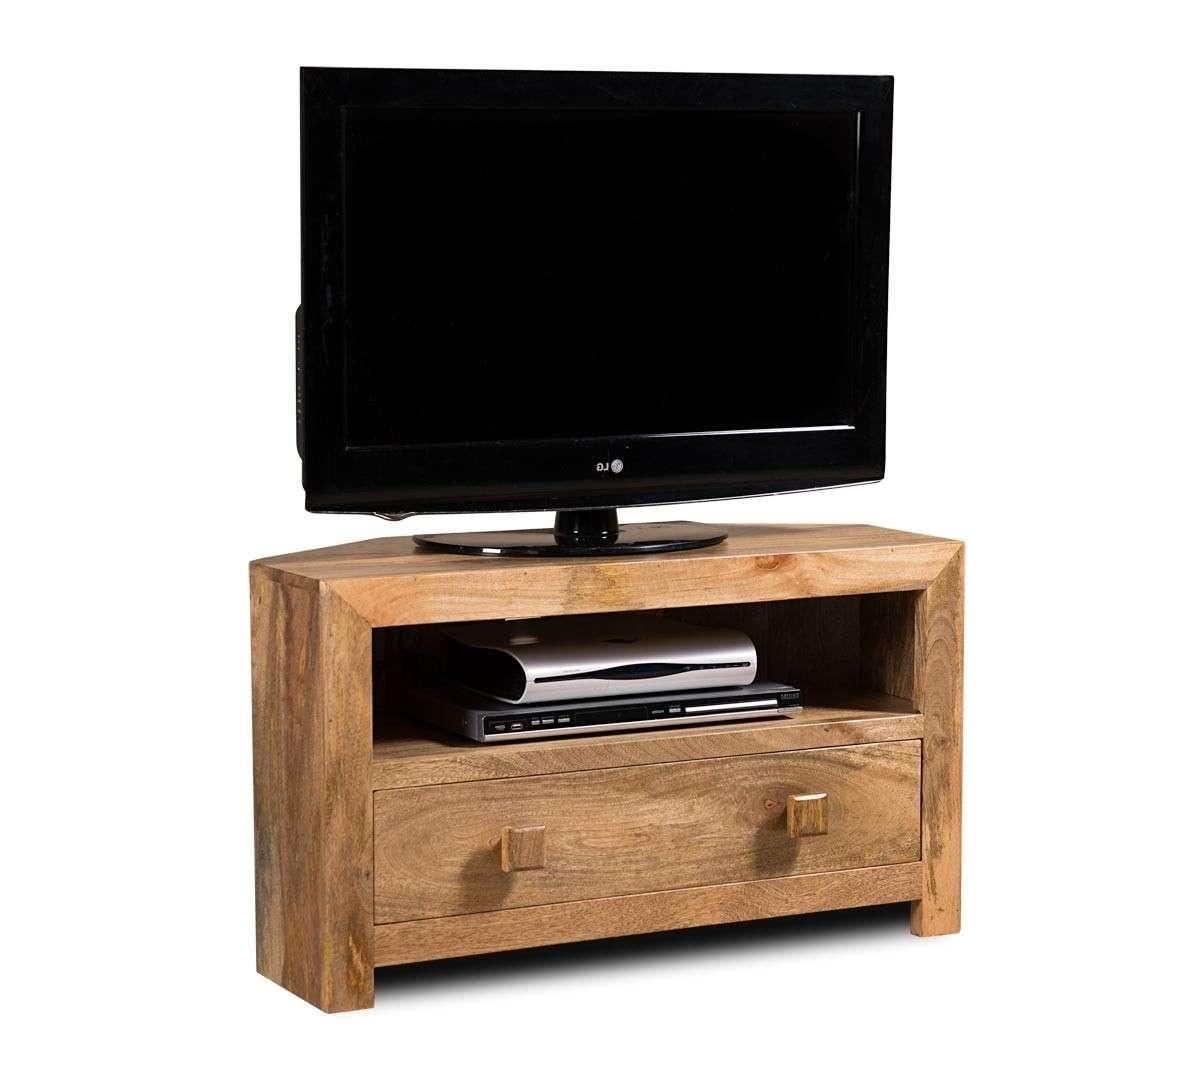 Dakota Light Mango Small Corner Tv Stand | Casa Bella Furniture Uk With Large Corner Tv Cabinets (View 12 of 20)